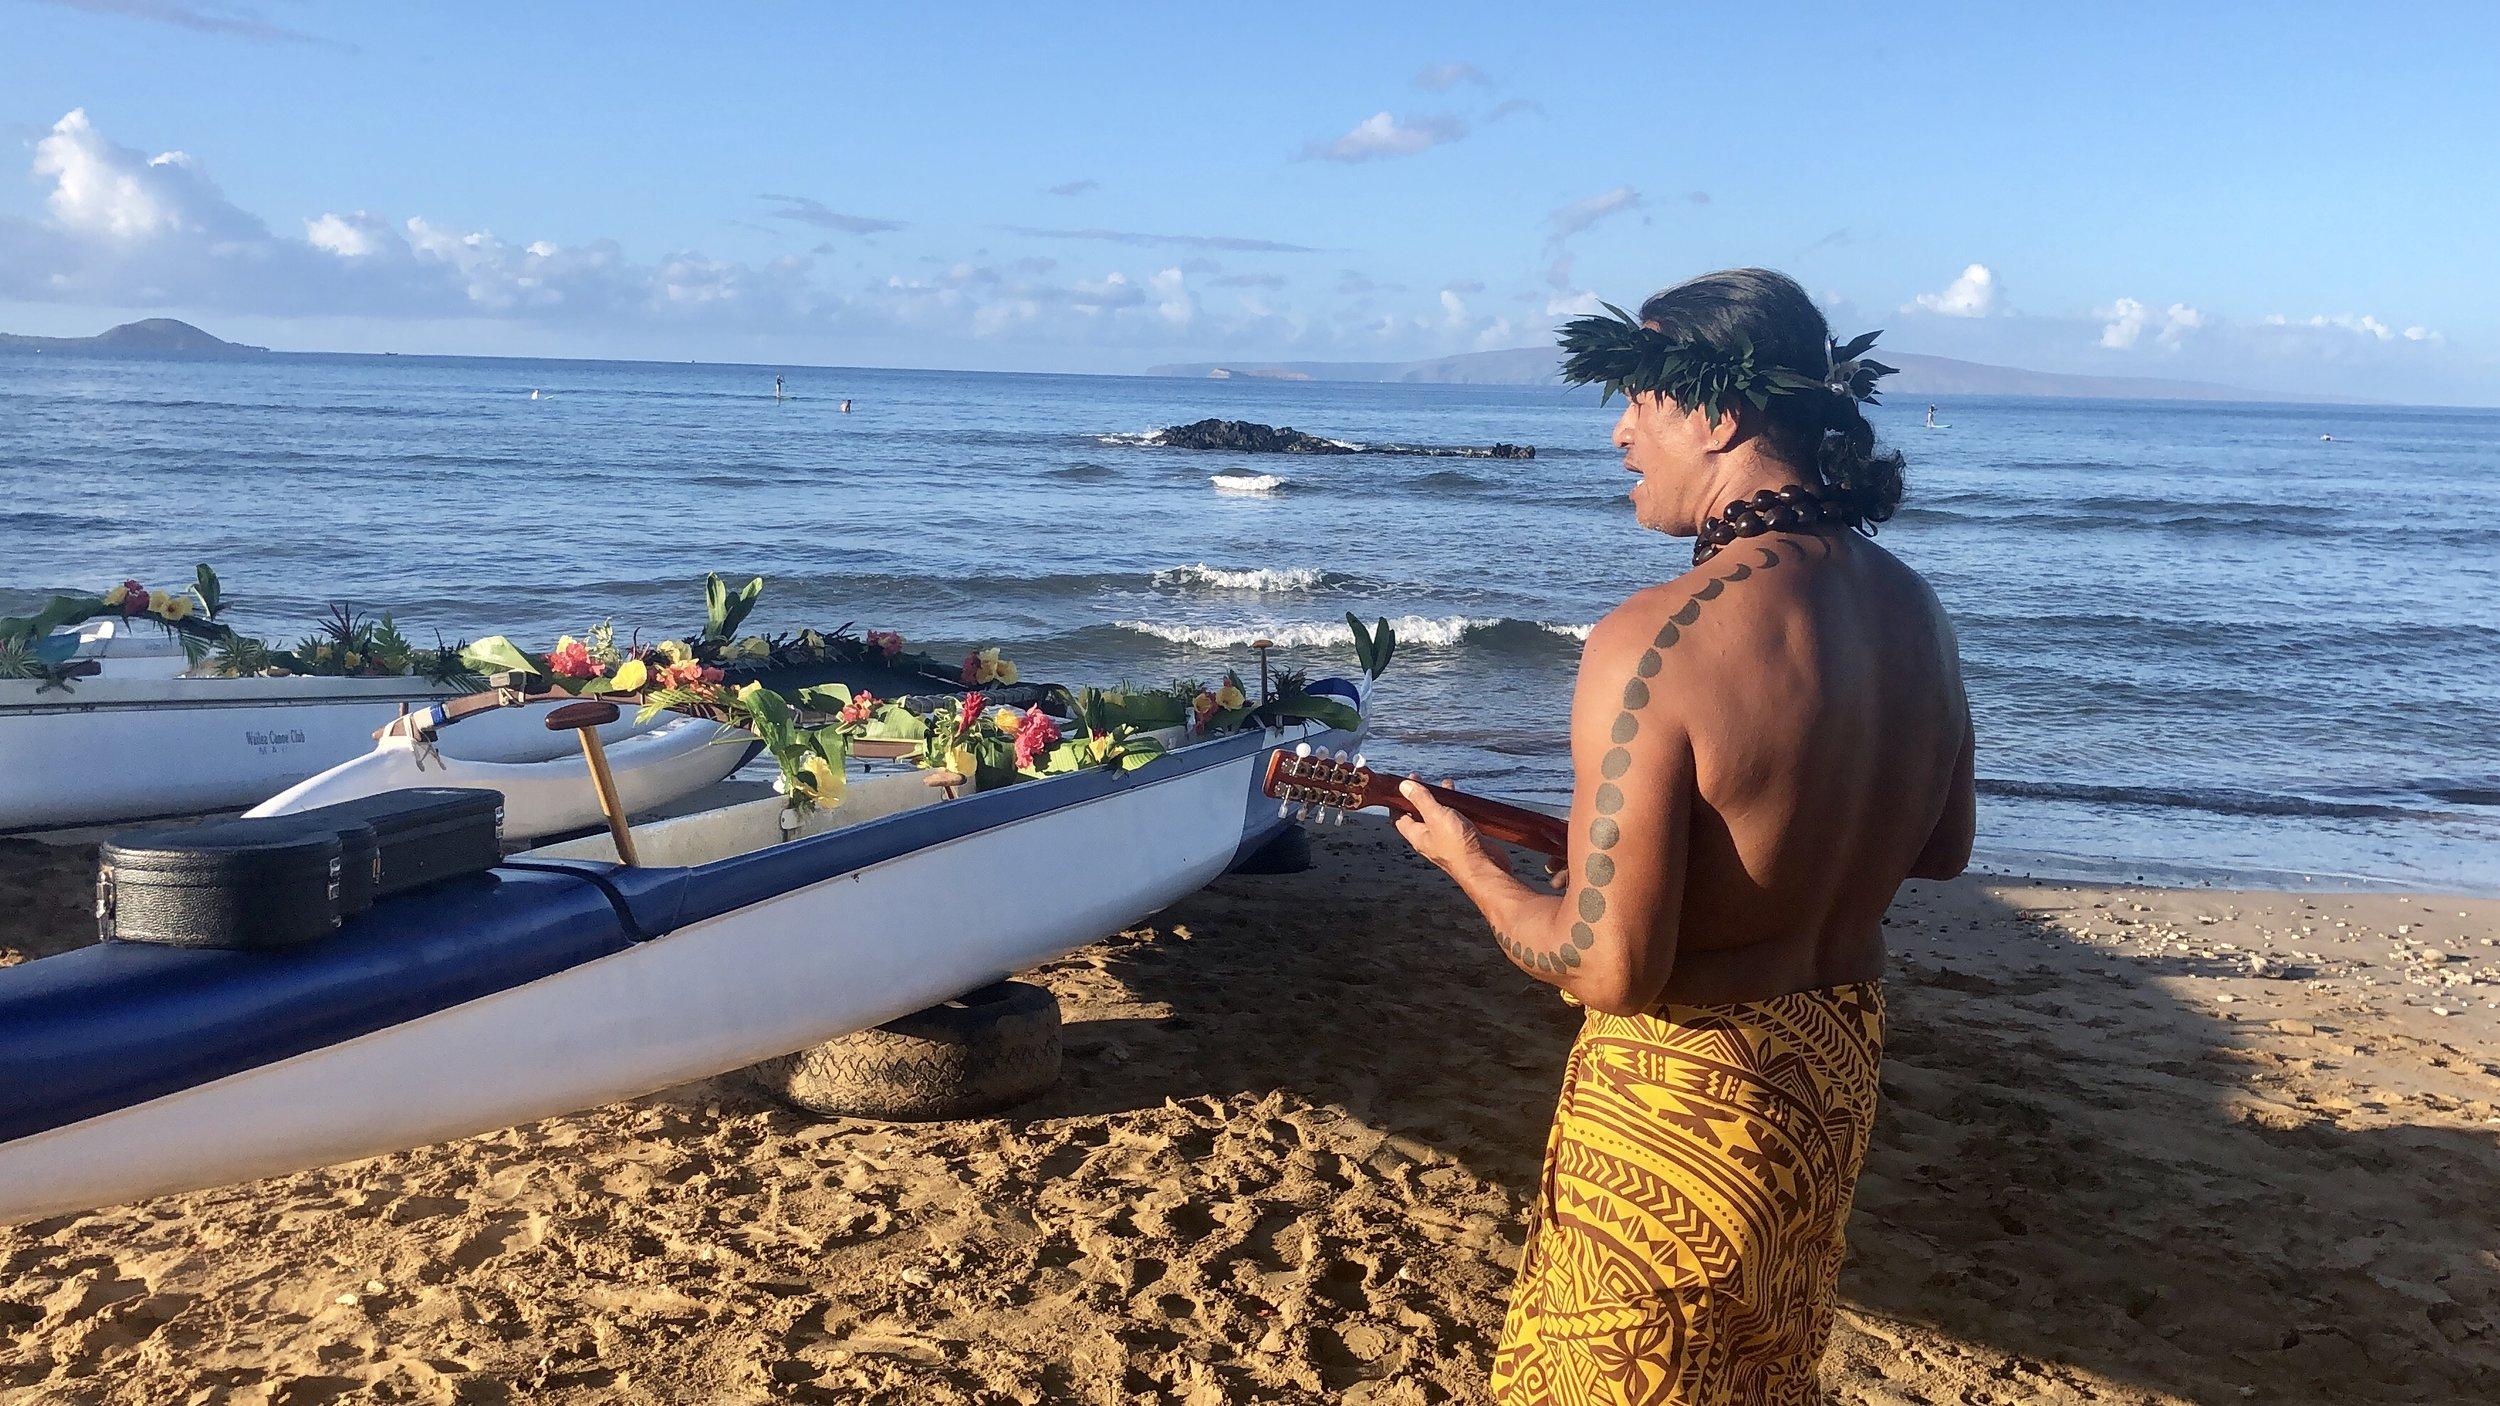 Blue_Soul_Maui_Ash_Scattering_Ceremony_1.jpg